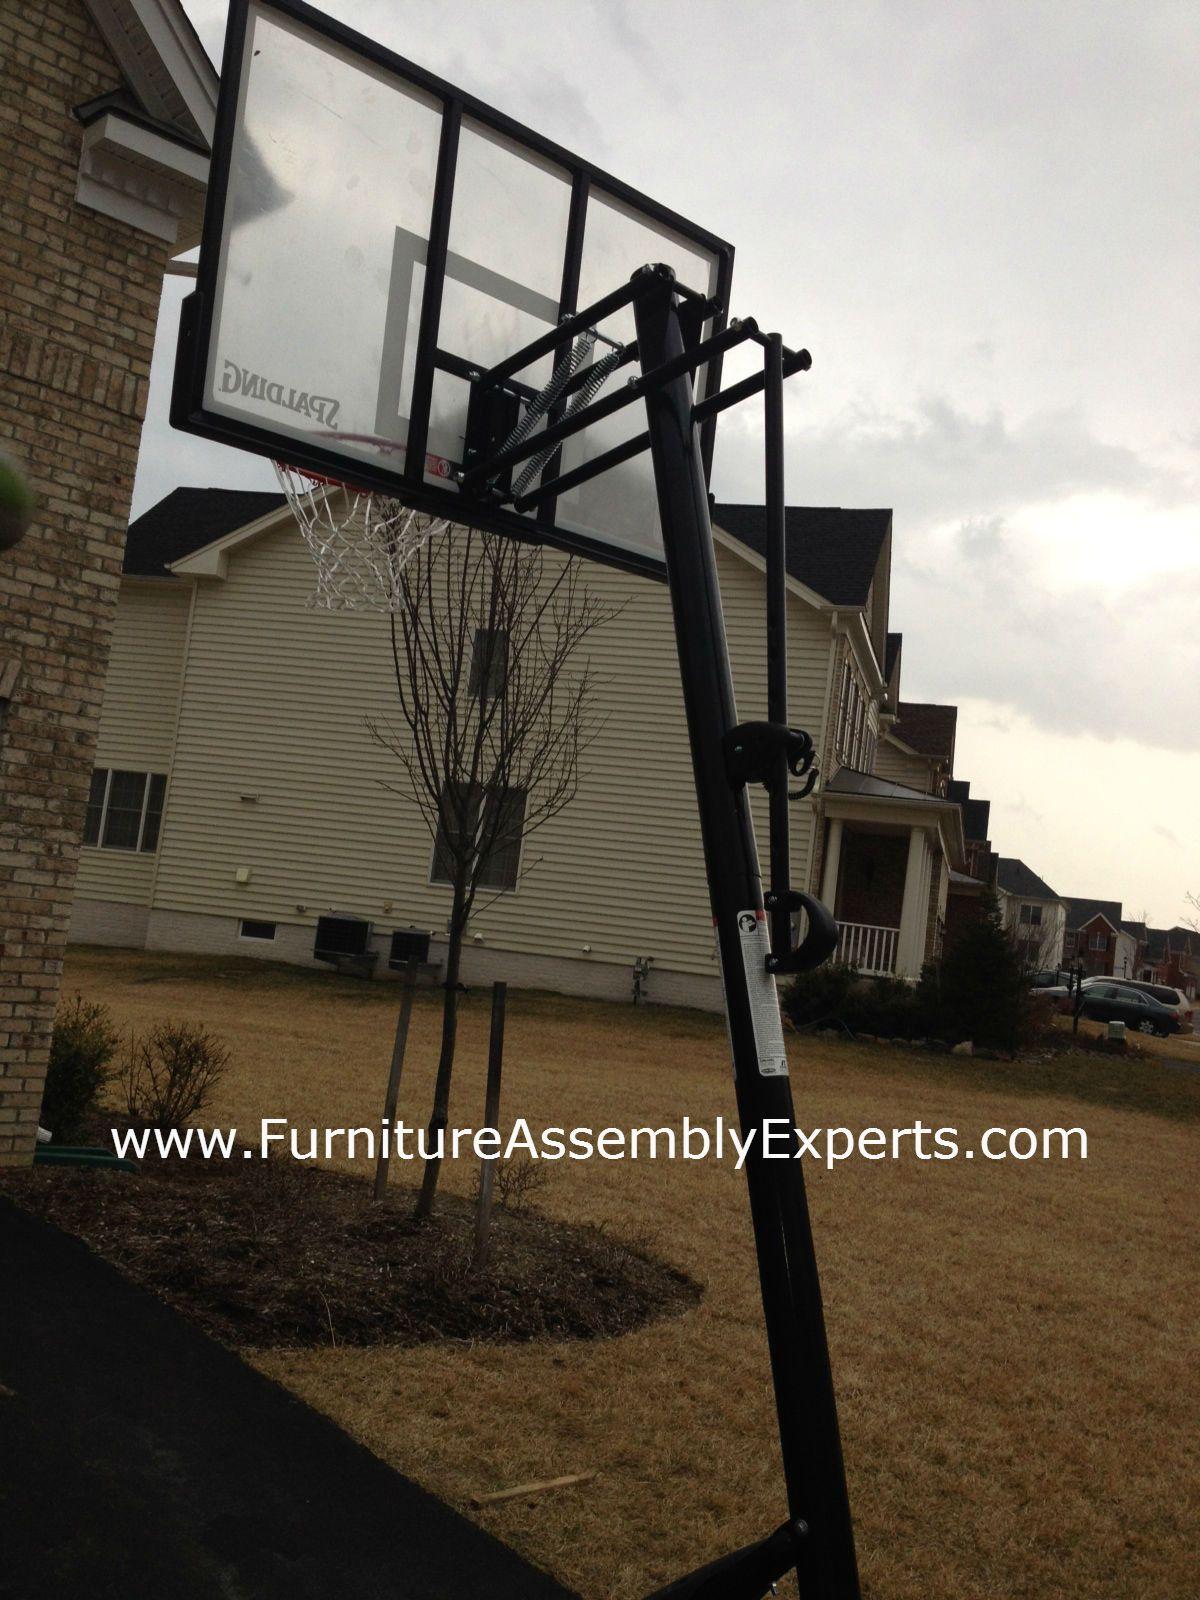 lifetime portable basketball hoop assembled in leesburg va by